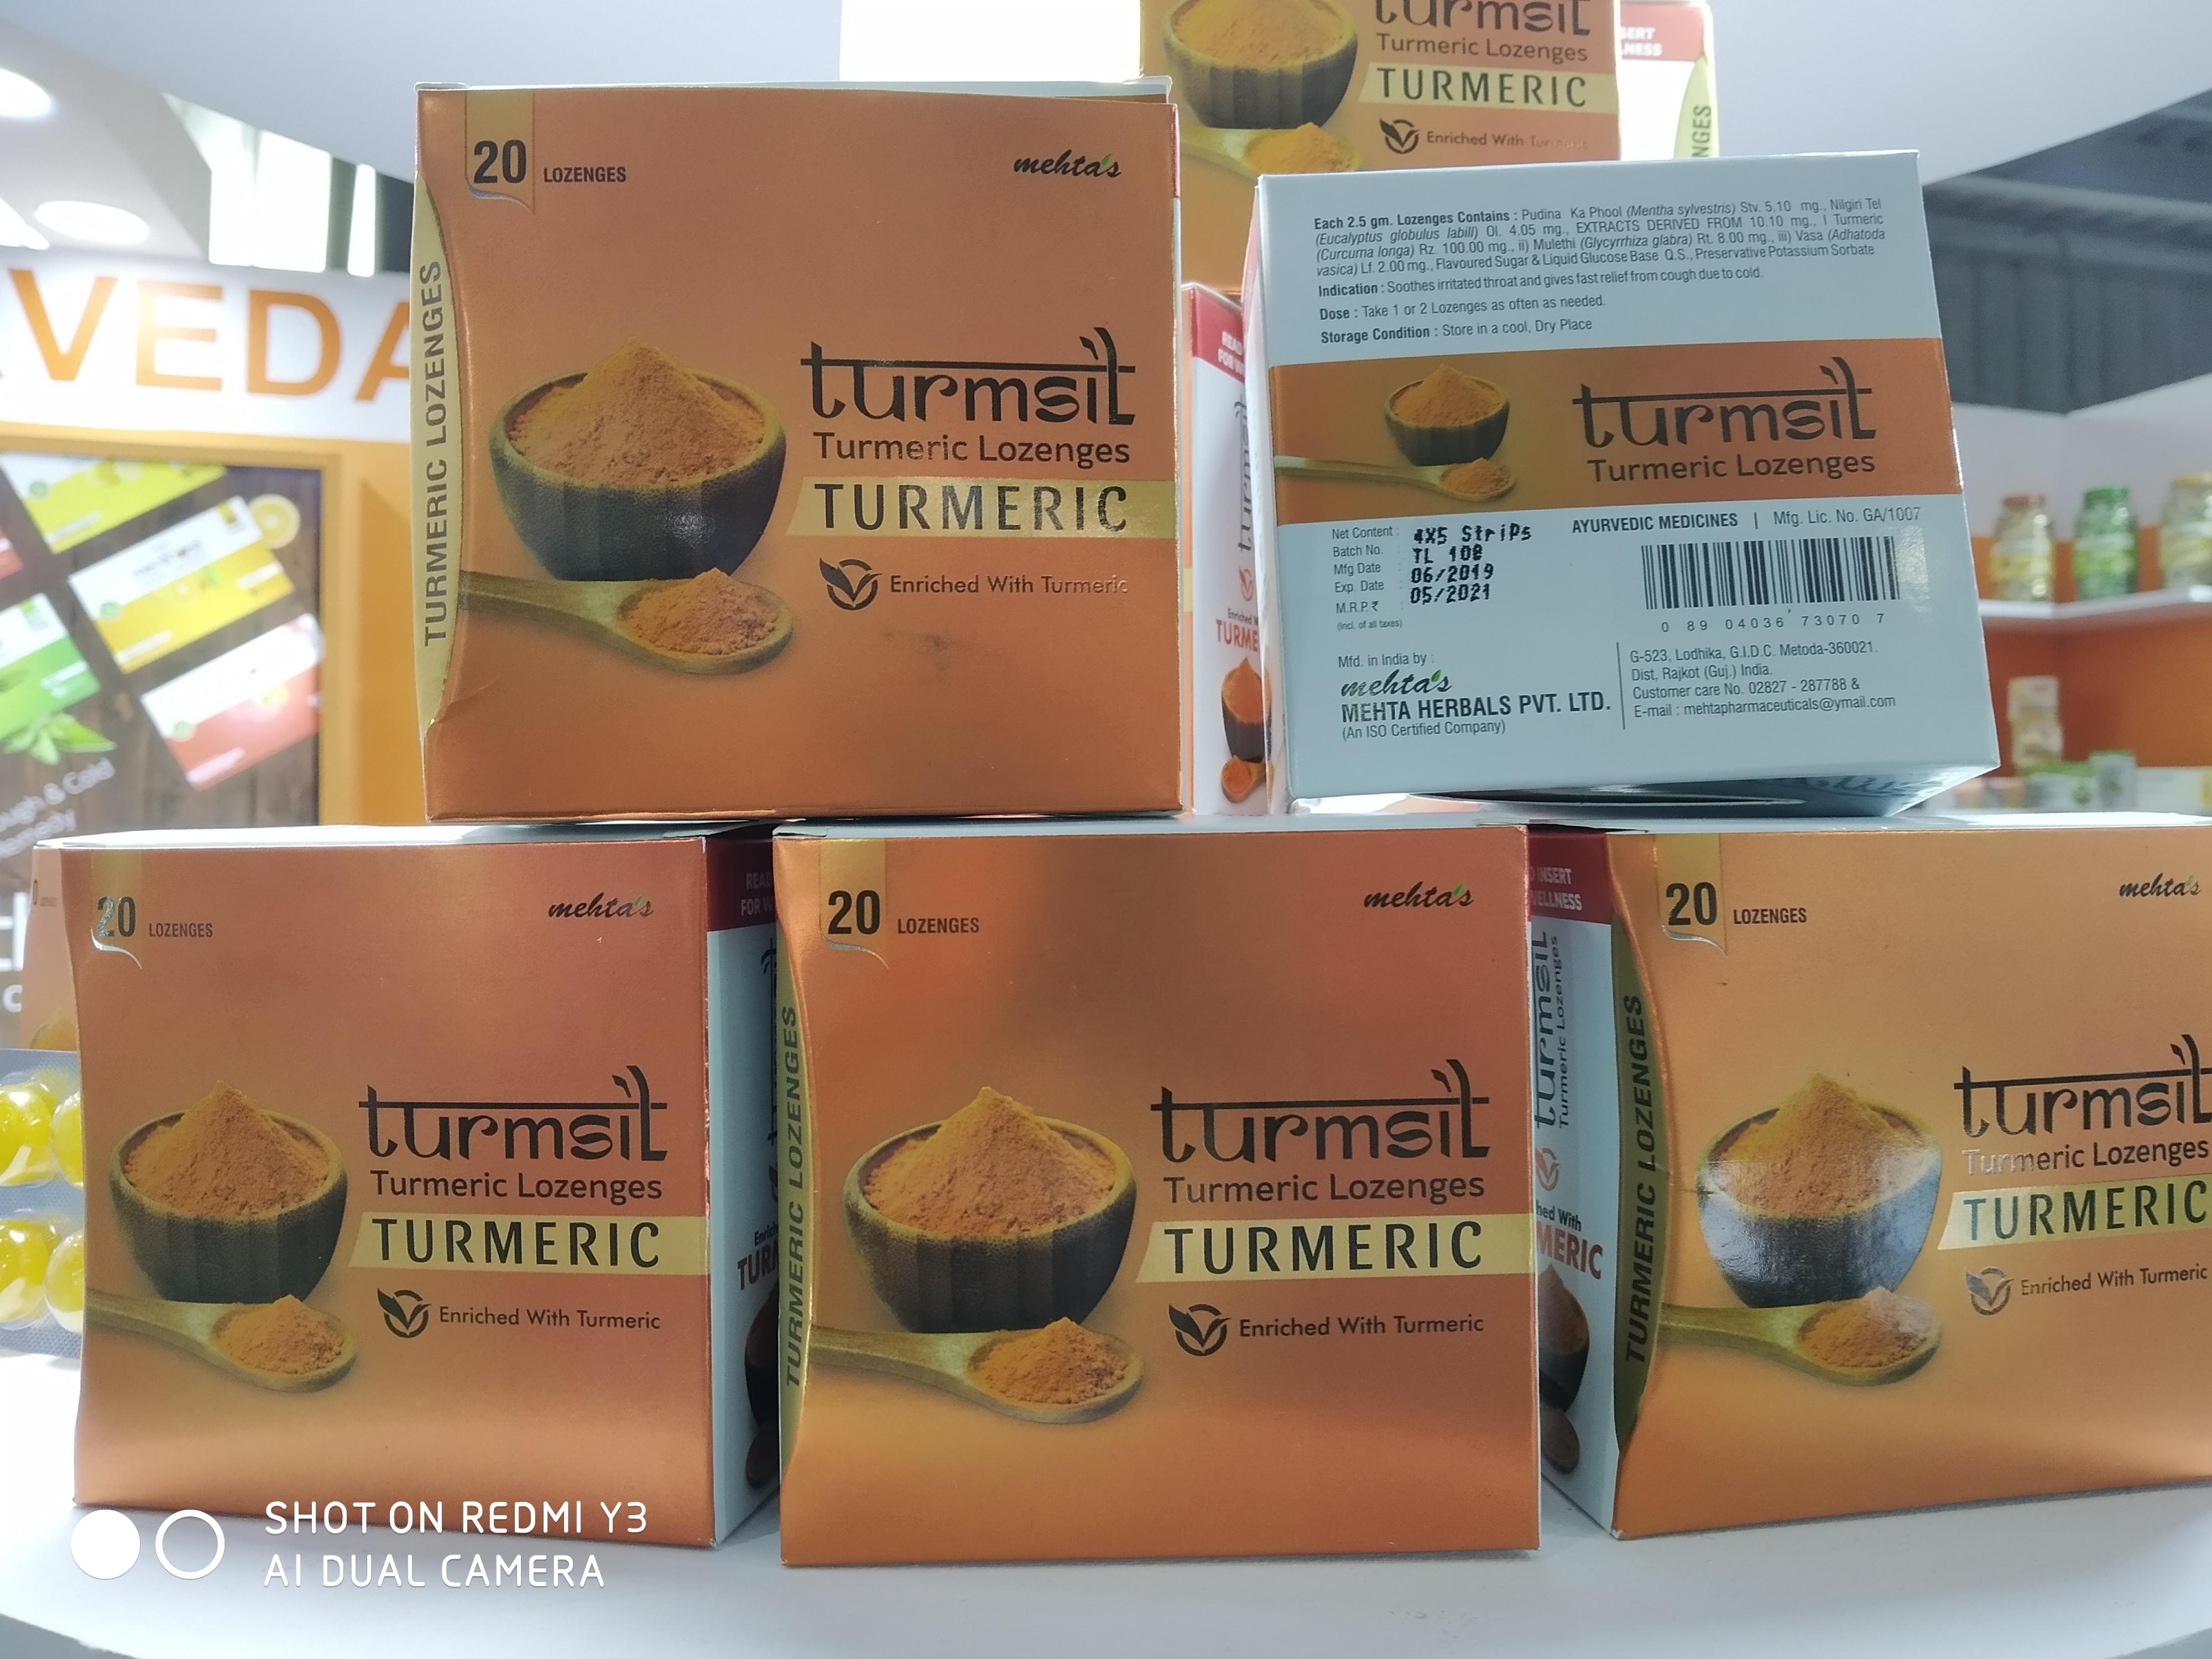 Turmeric Lozenges